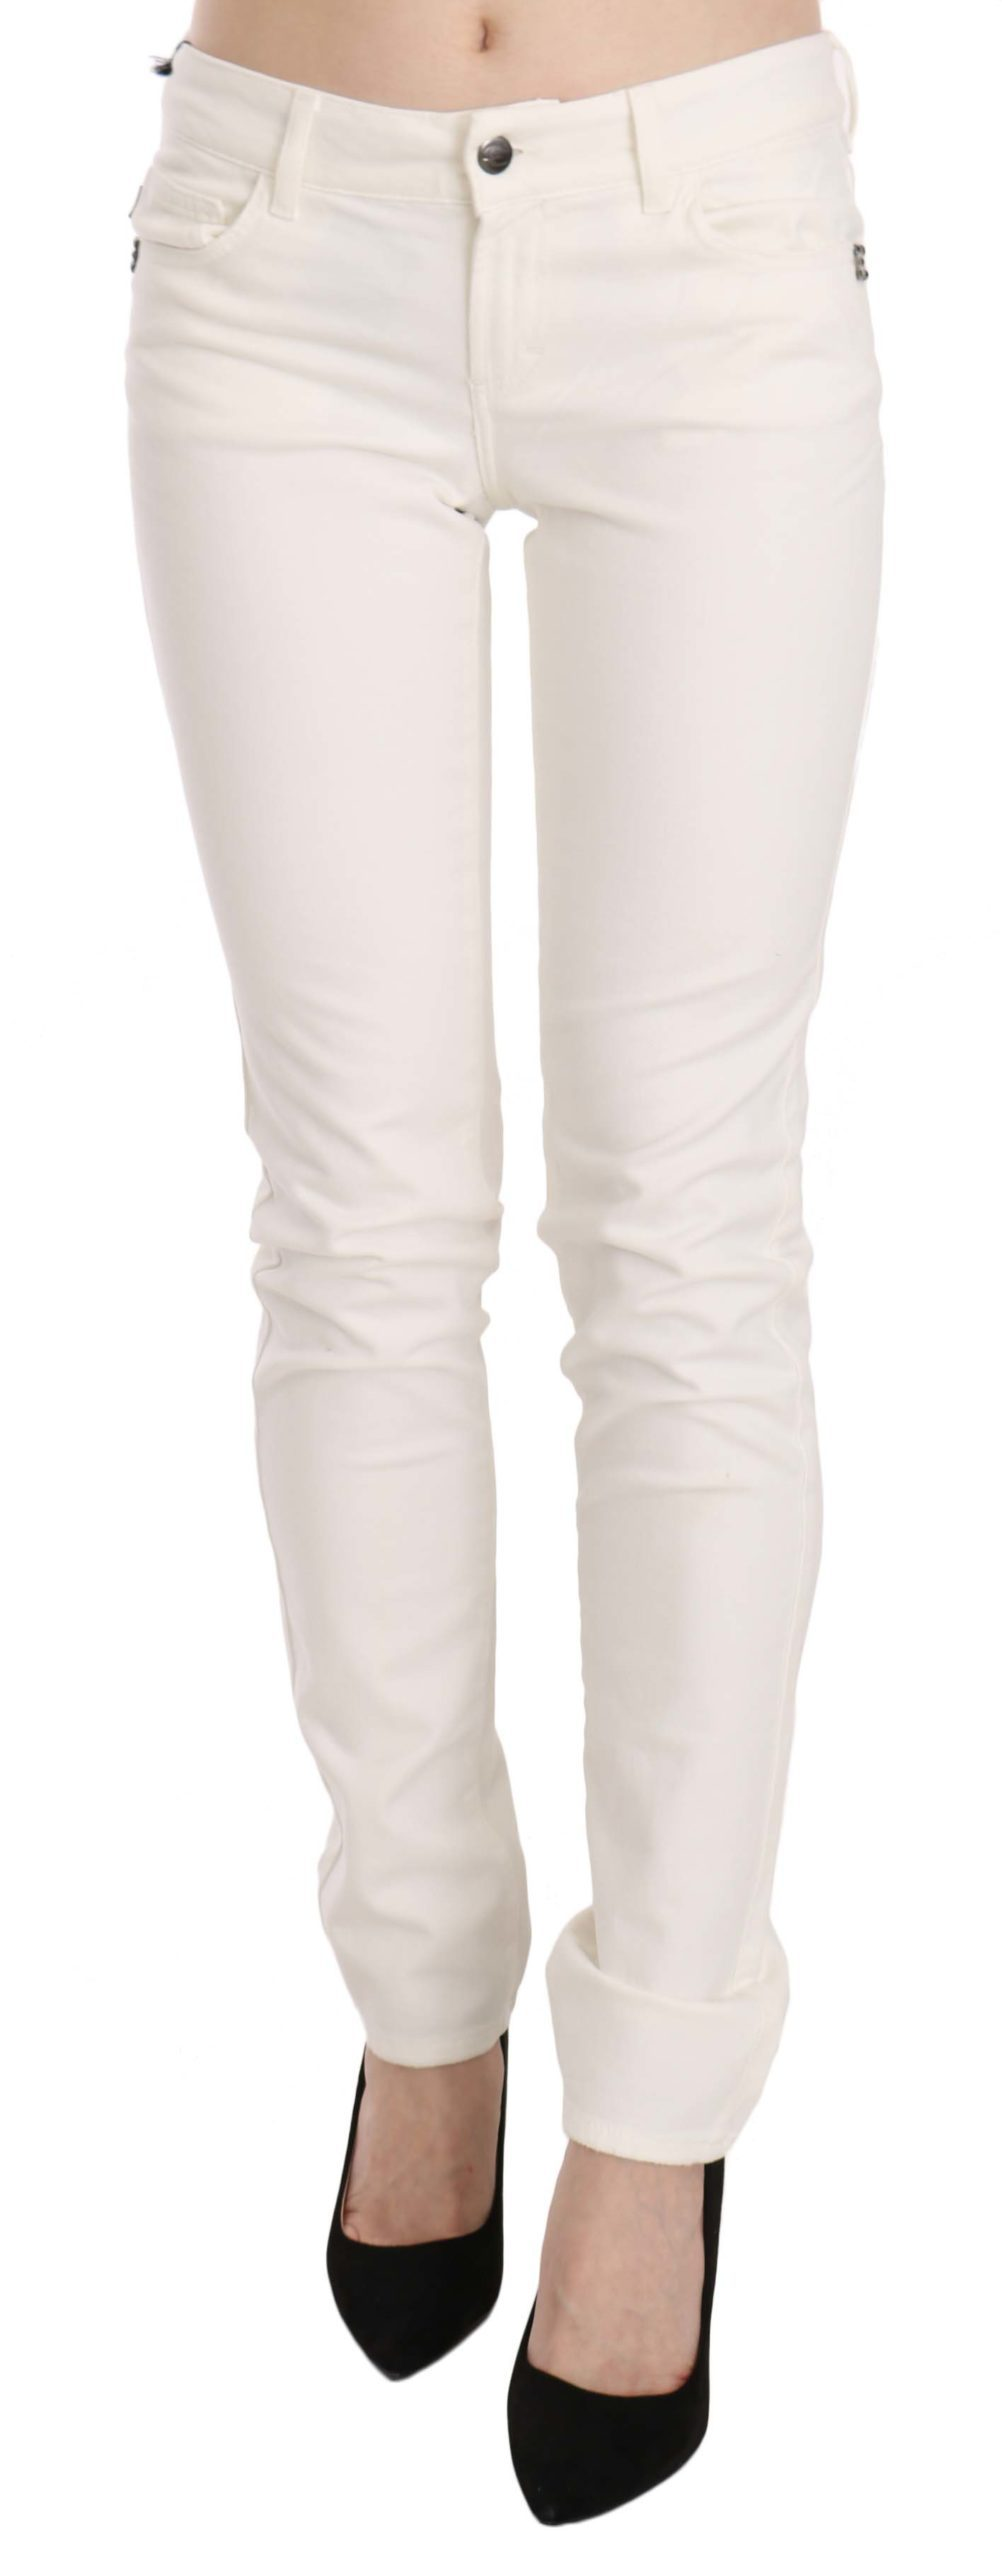 Cavalli Women's Cotton Low Waist Skinny Denim Trouser White PAN70350 - W28